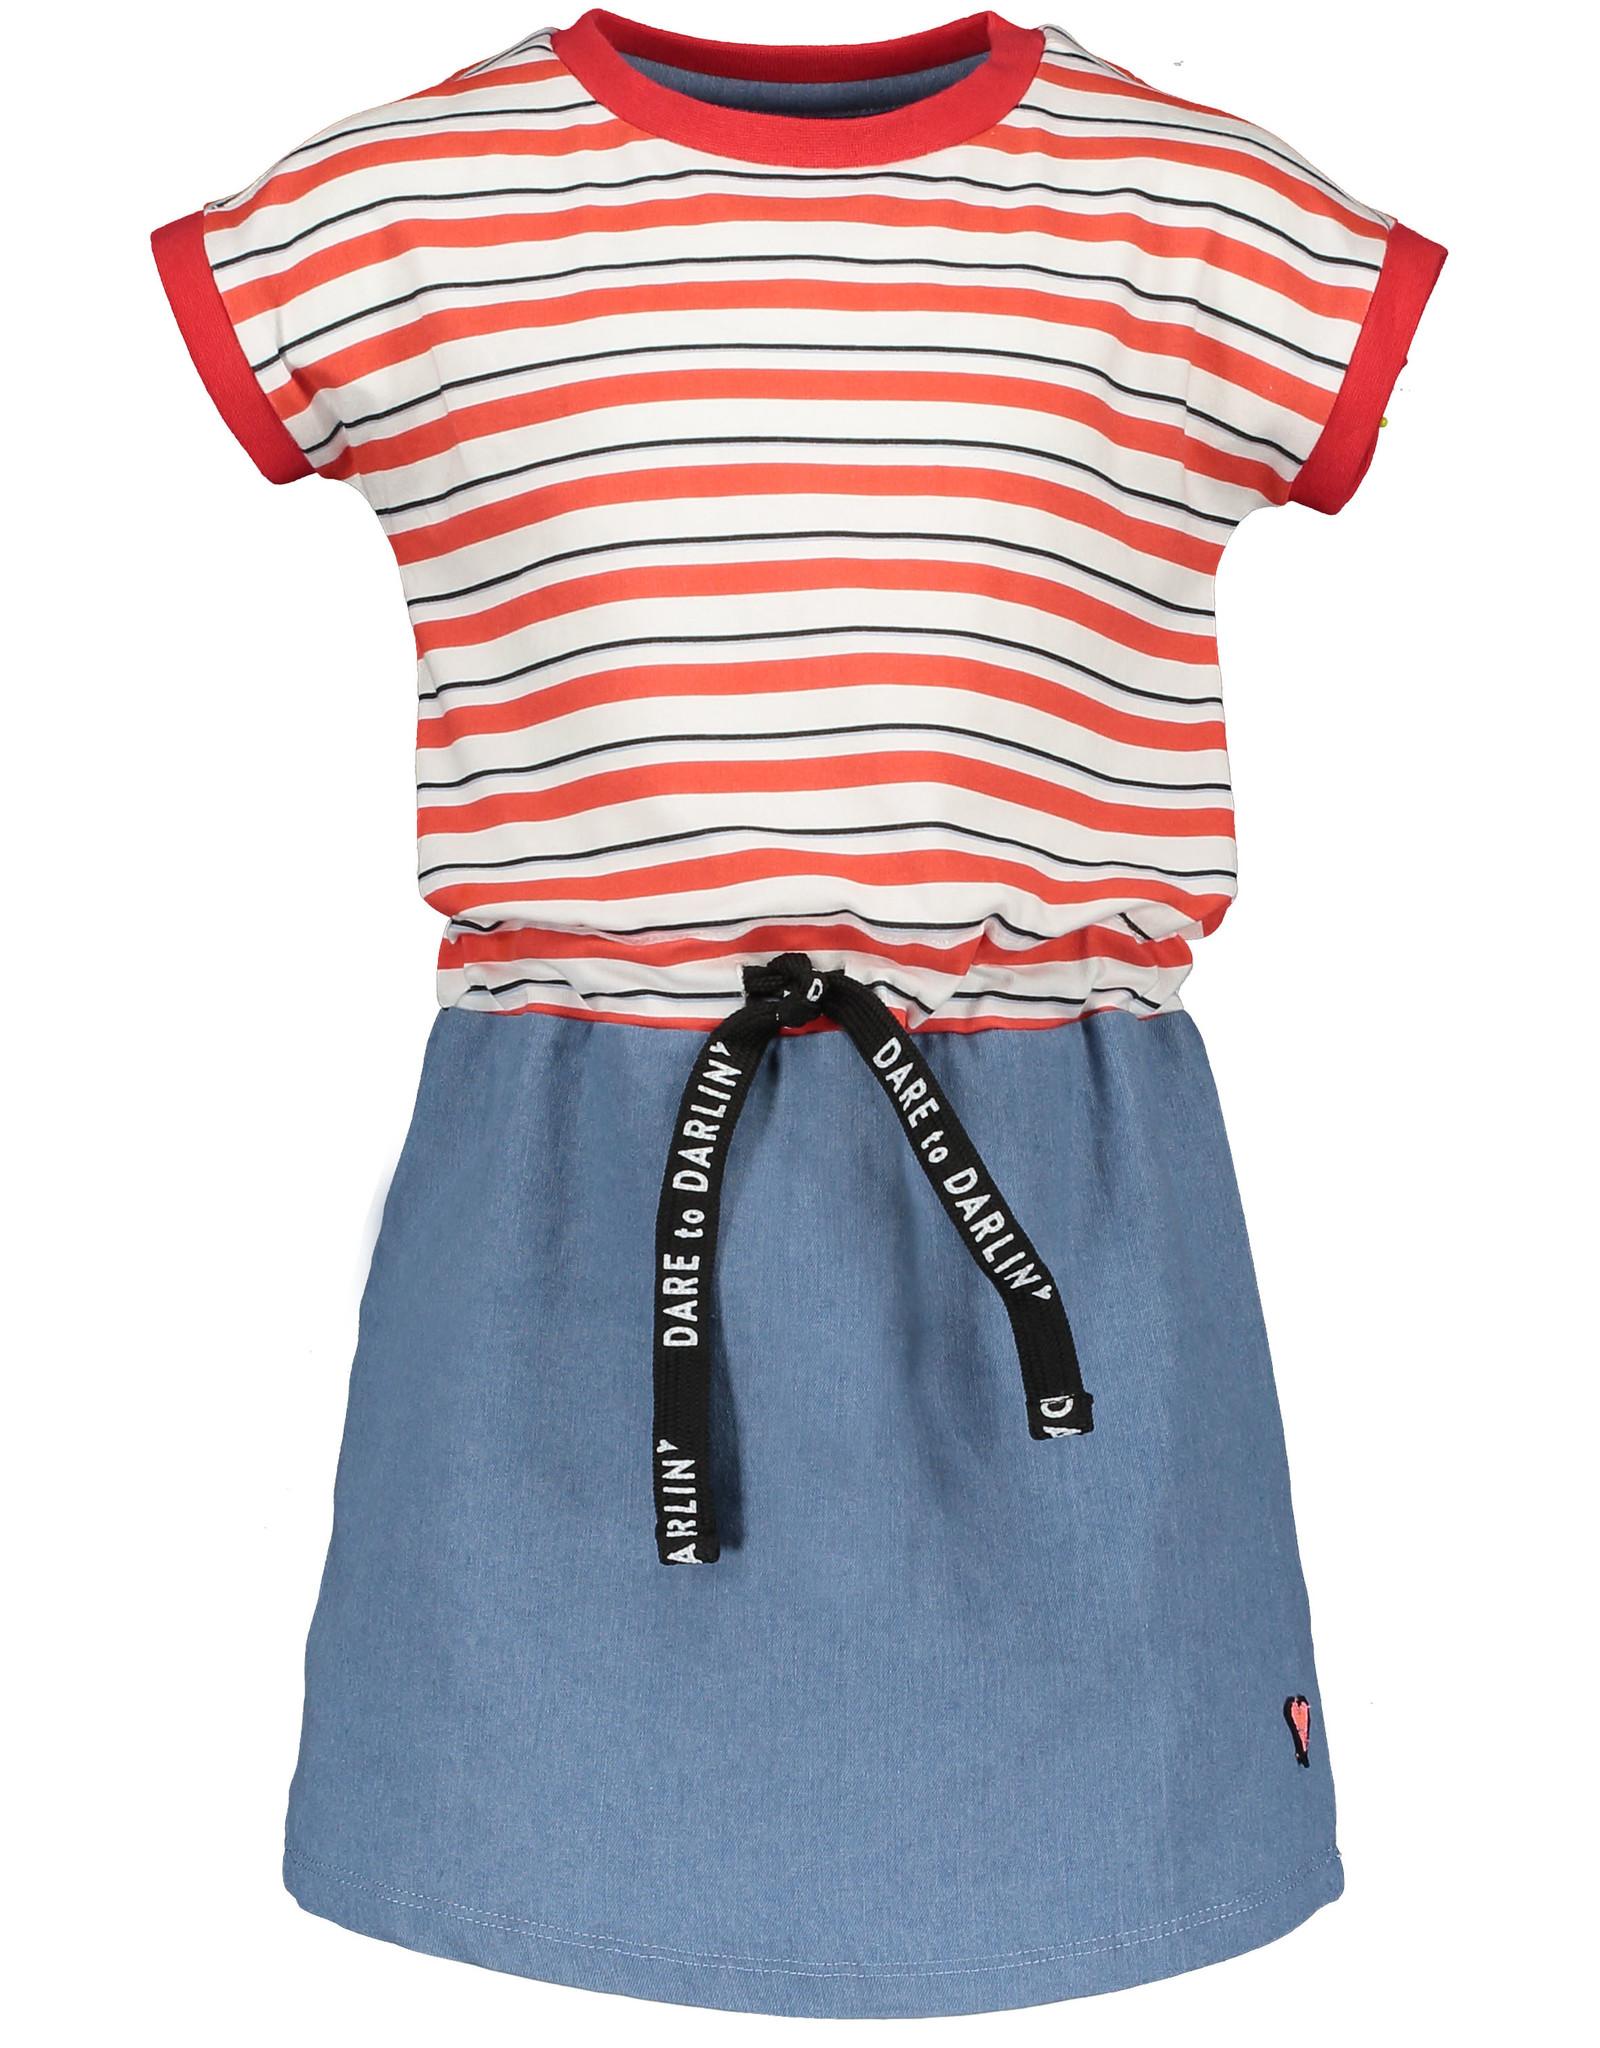 Moodsteet Darlin Moodstreet Darlin Dress contrast Skirt Soft Red